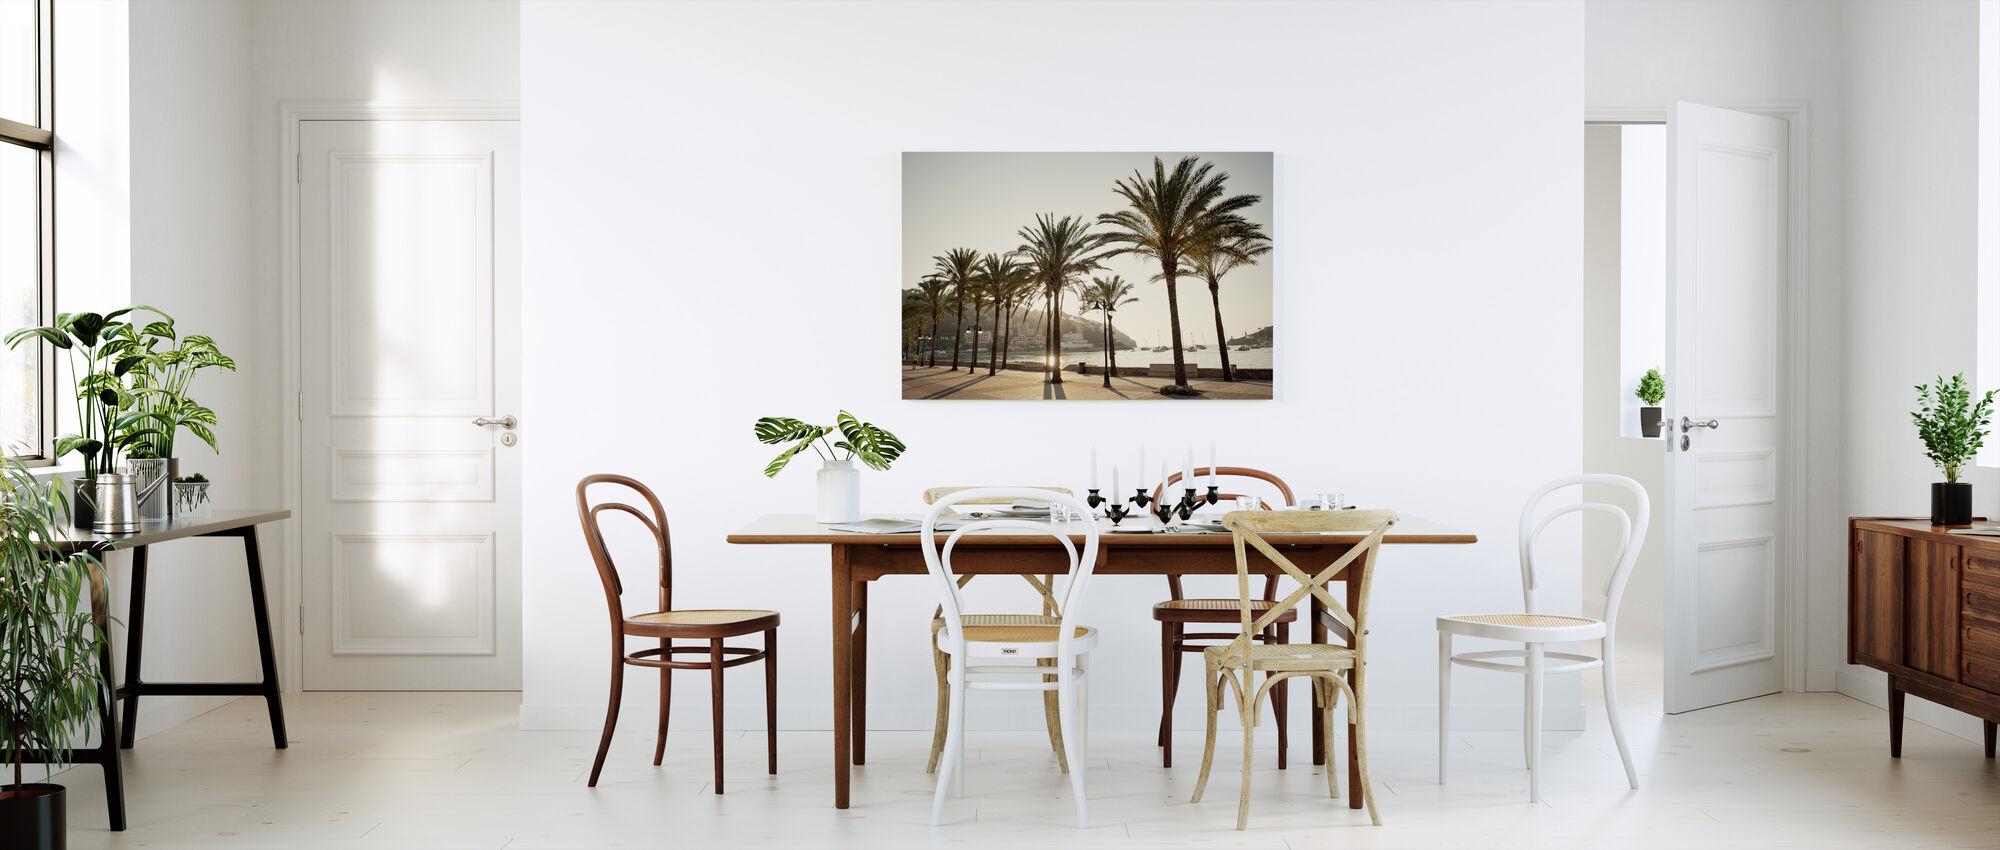 Mallorca Boardwalk - Canvas print - Kitchen